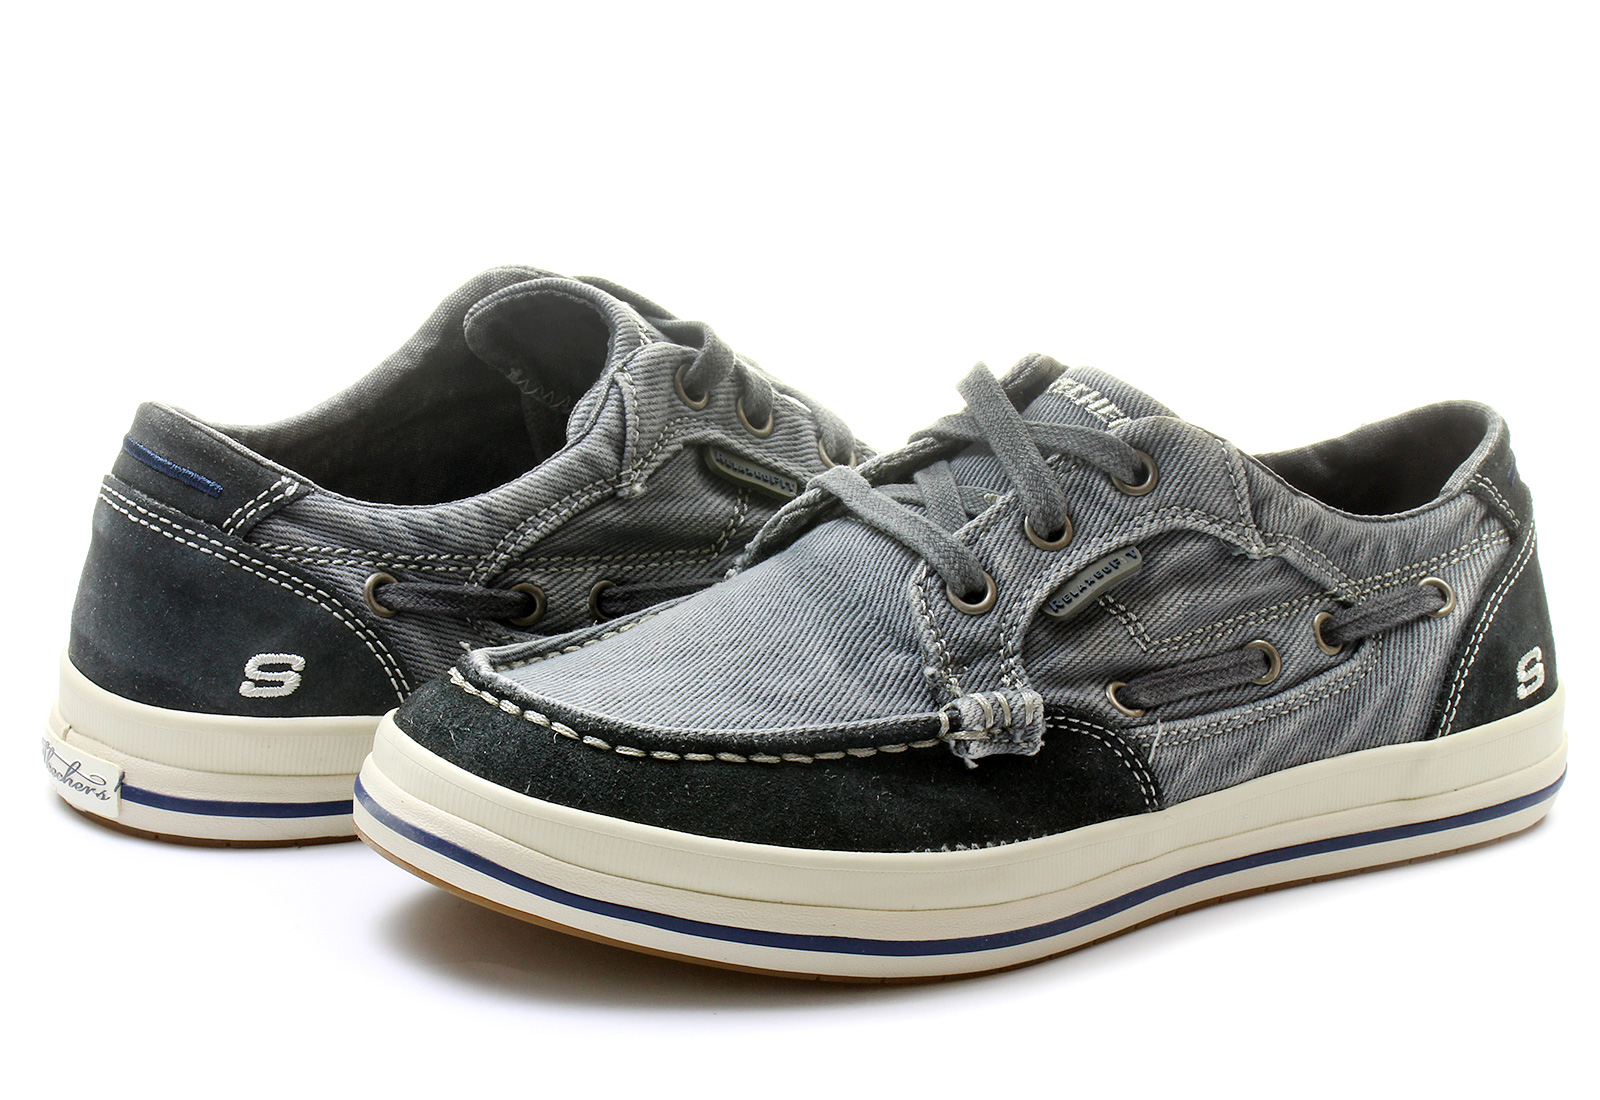 Skechers Diamondback férfi utcai cipő , Férfi cipő | utcai